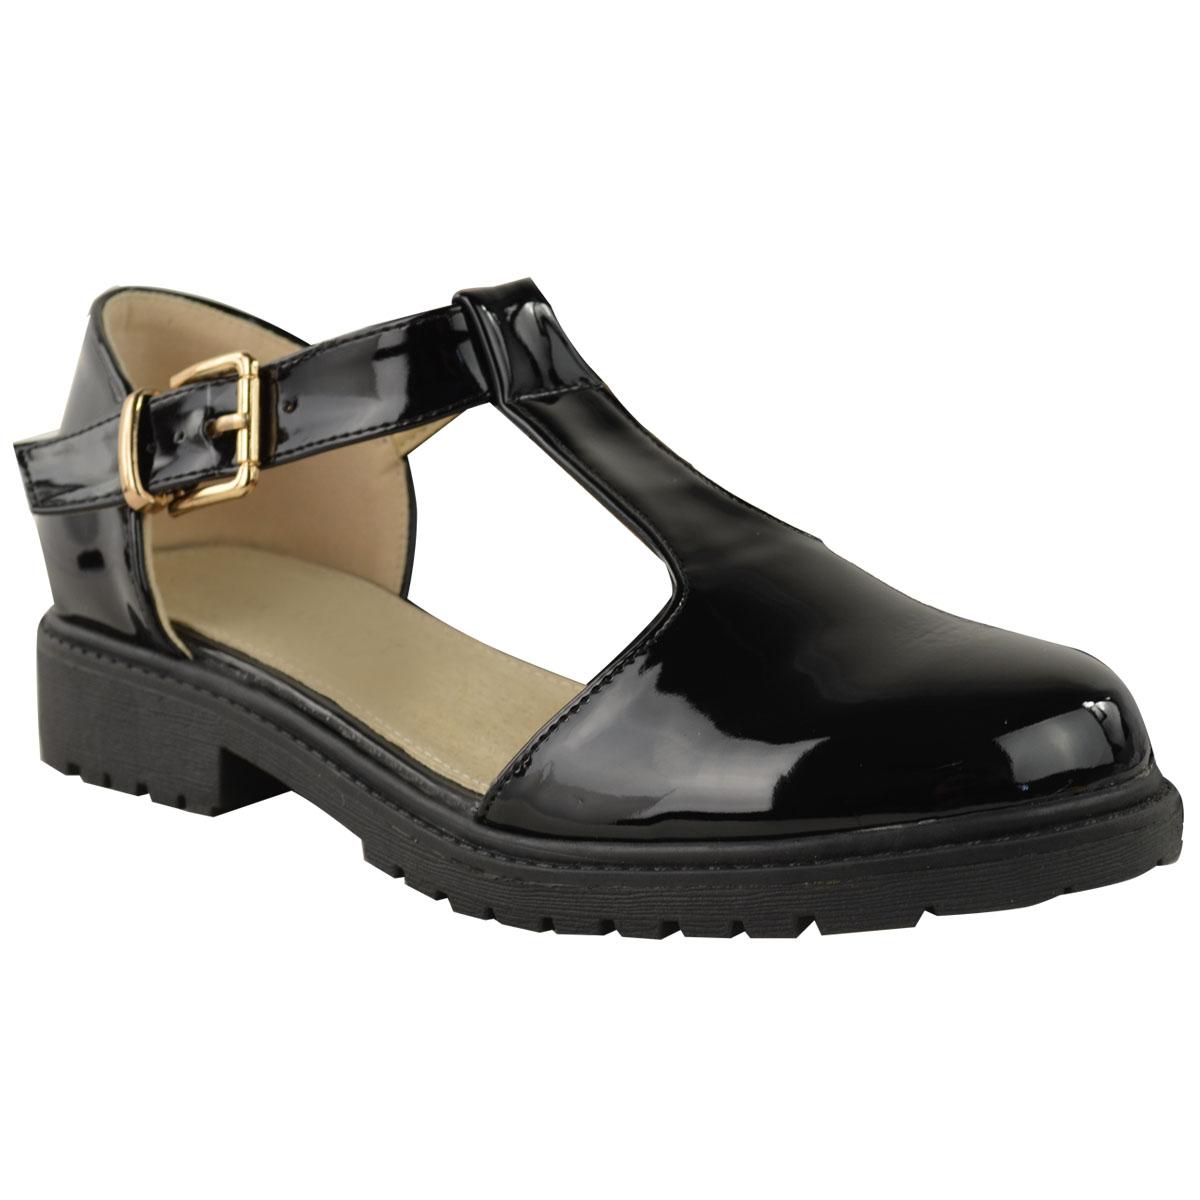 Girls School Shoes Uk Size